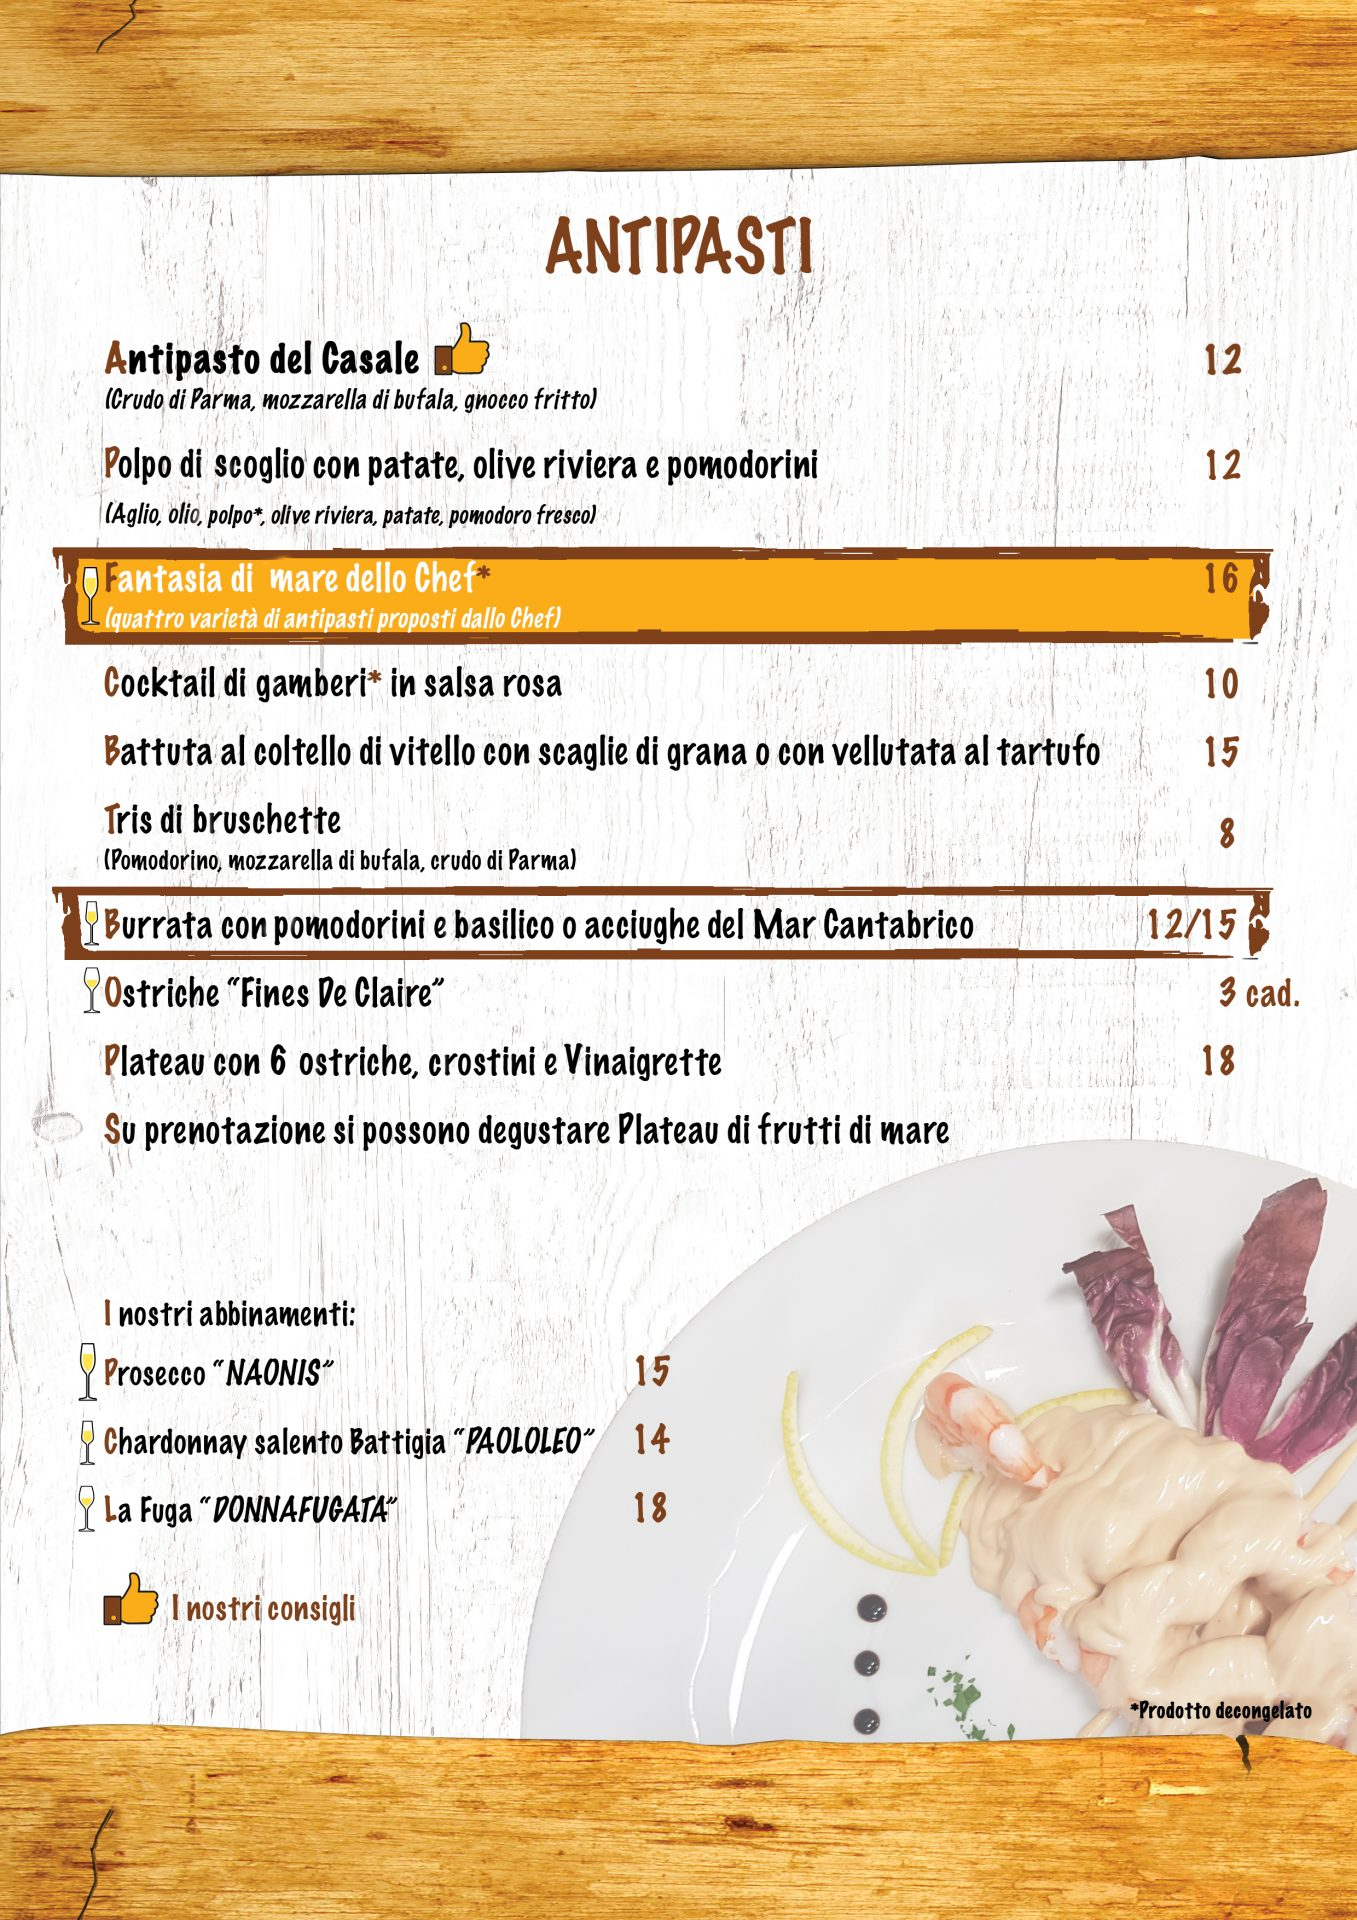 Antipasti menù casale 93-4